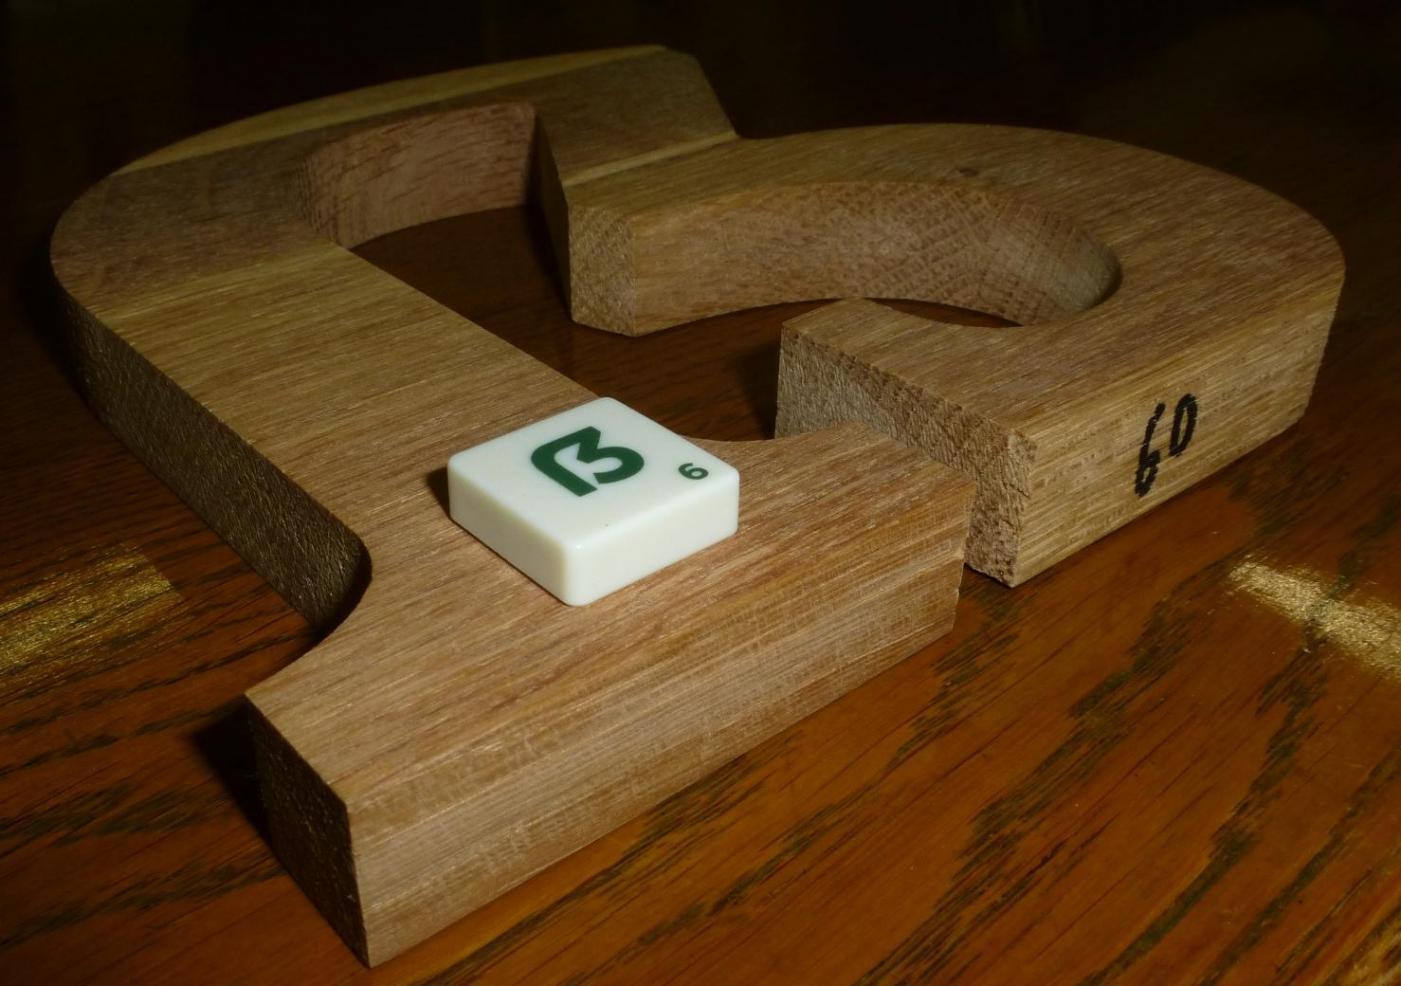 Scrabble-Eszett.thumb.jpg.2fcfad799e1b8621196e875cd635c4d0.jpg